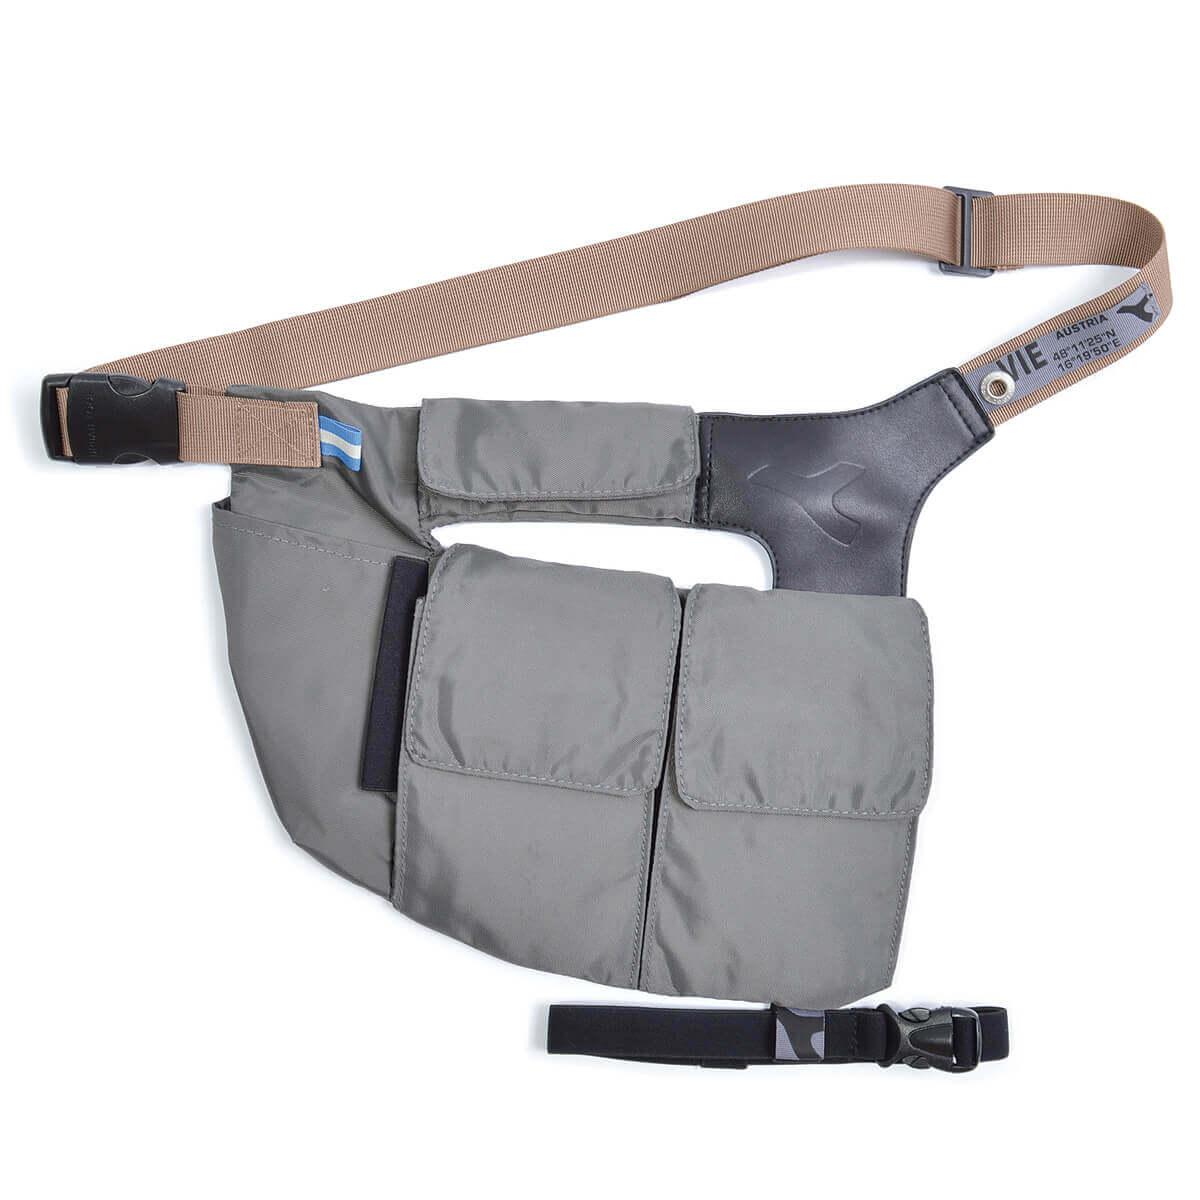 Beintasche Handy Hüfttasche Geldbörse Gurt URBAN TOOL ® waistHolster